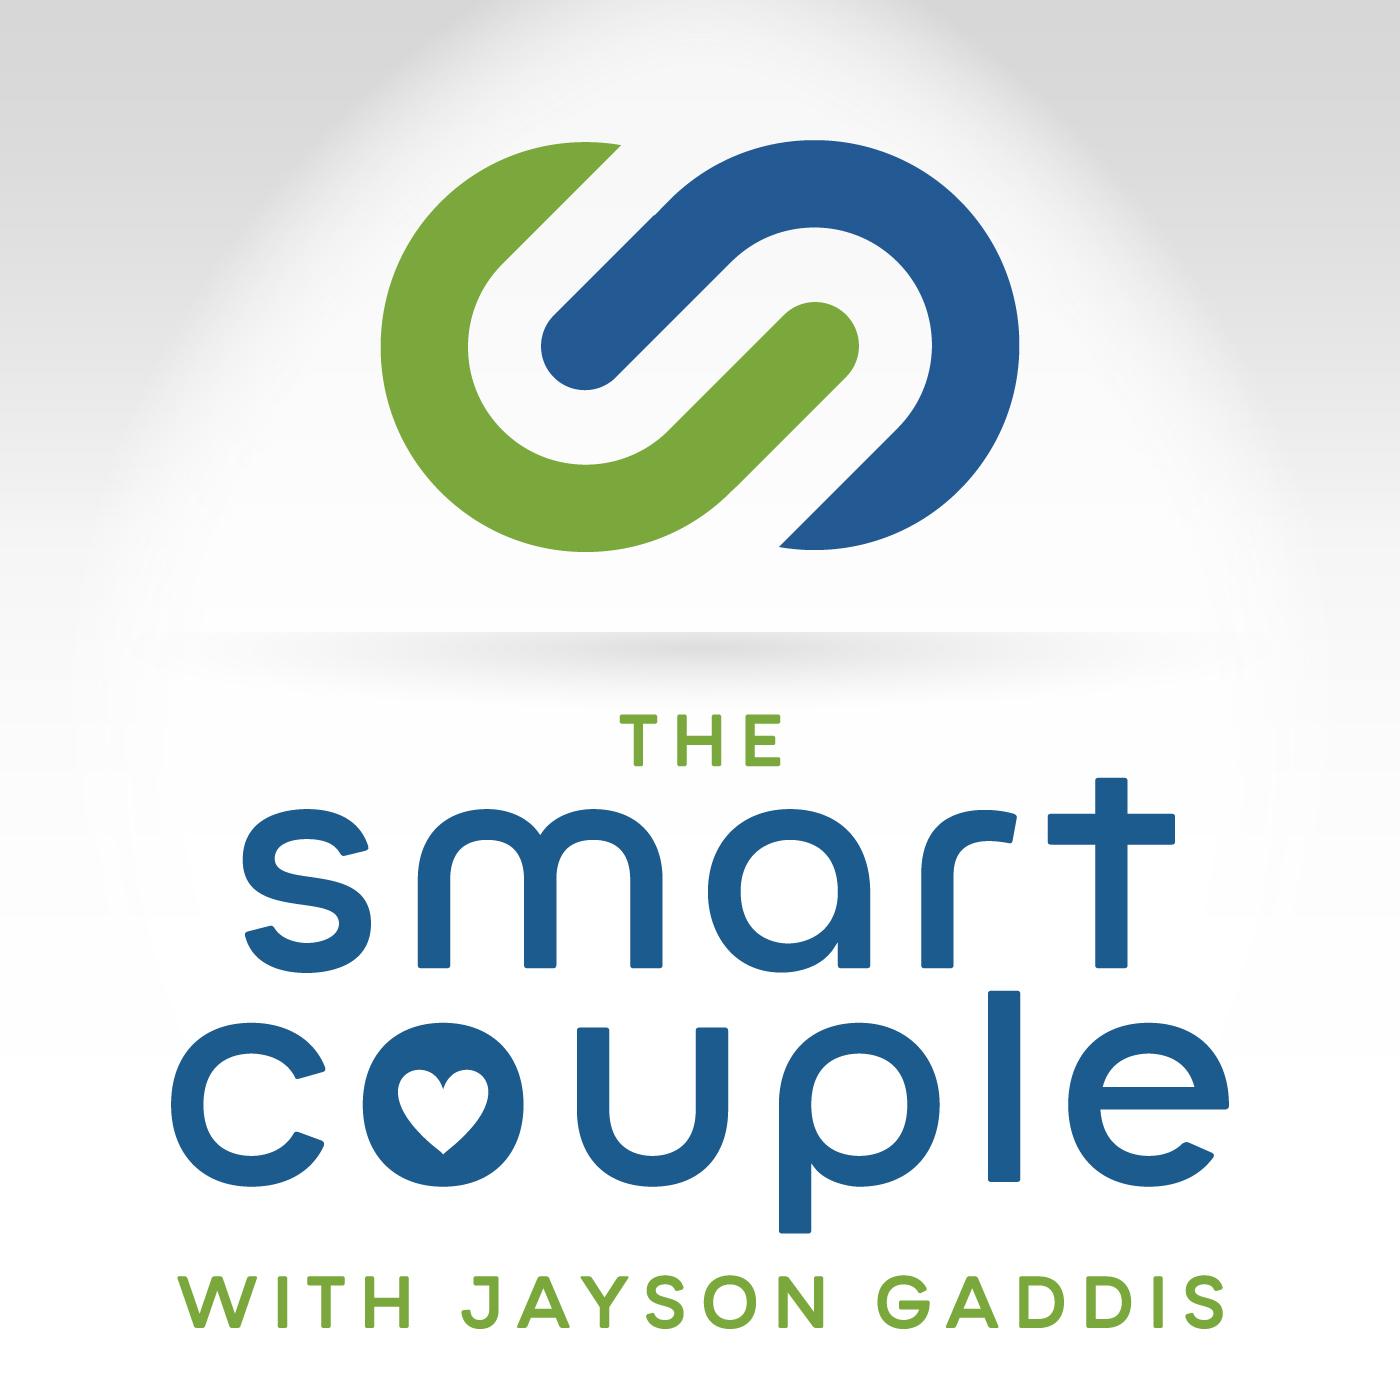 The Relationship School Podcast - DPIR- Practicing relationship skills for 9 months - Relationship School Podcast EPISODE 241